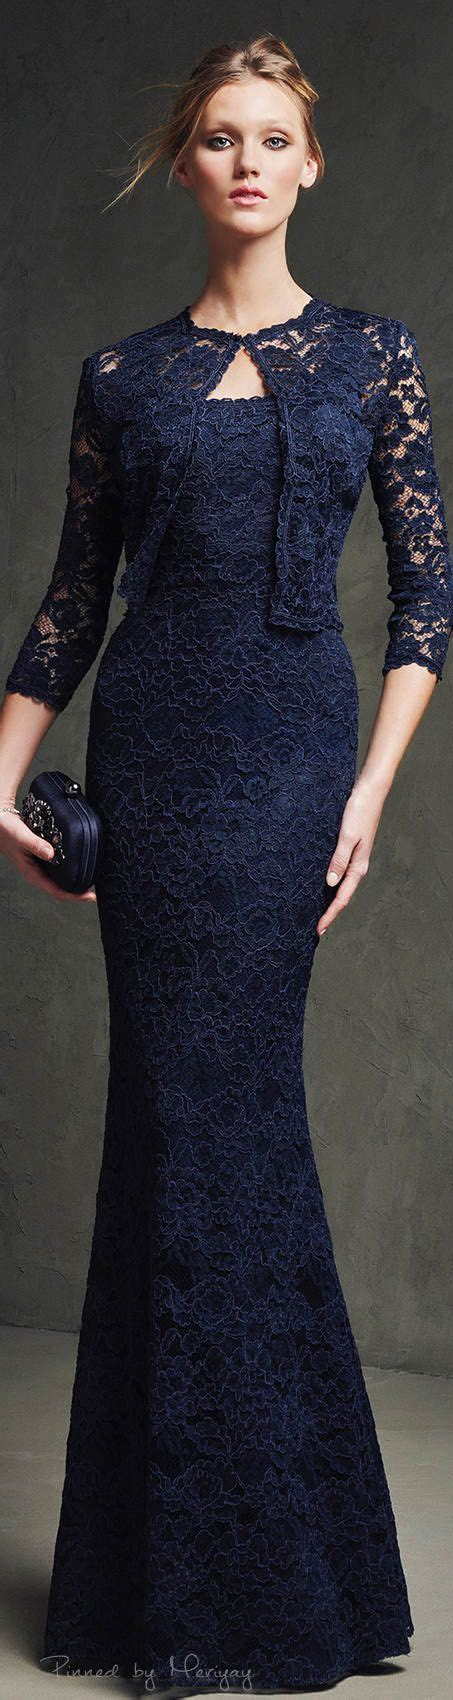 Set Longdress Bolero blue lace of the 2pc jacket and dress pretty